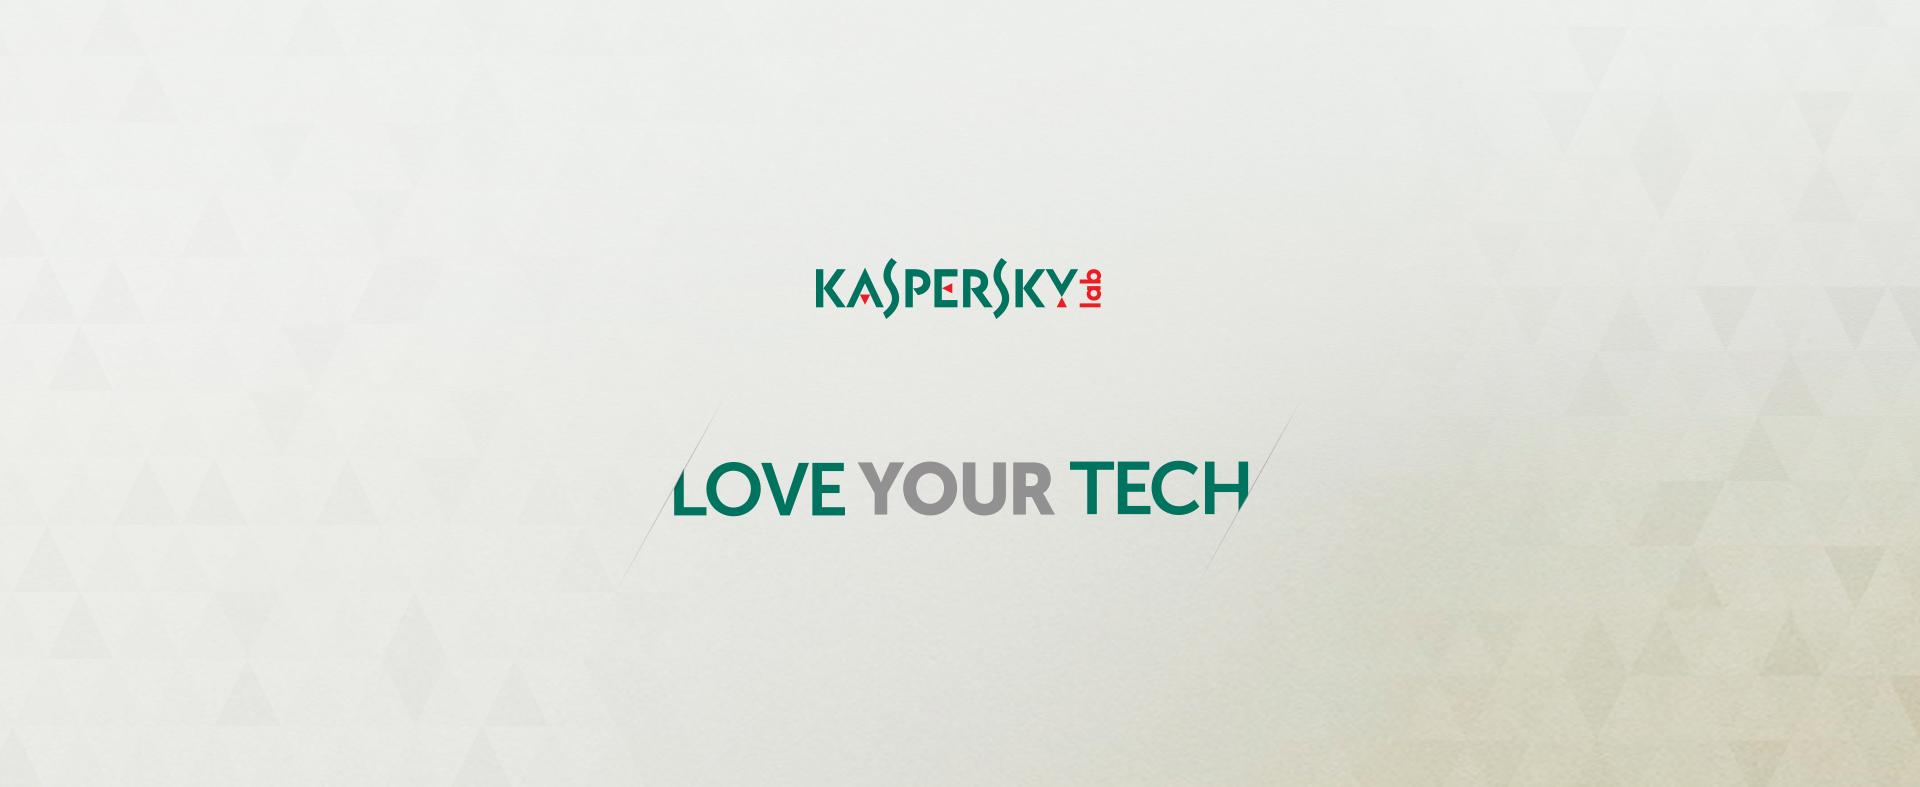 kaspersky_konya_bolge_bayi_megabim